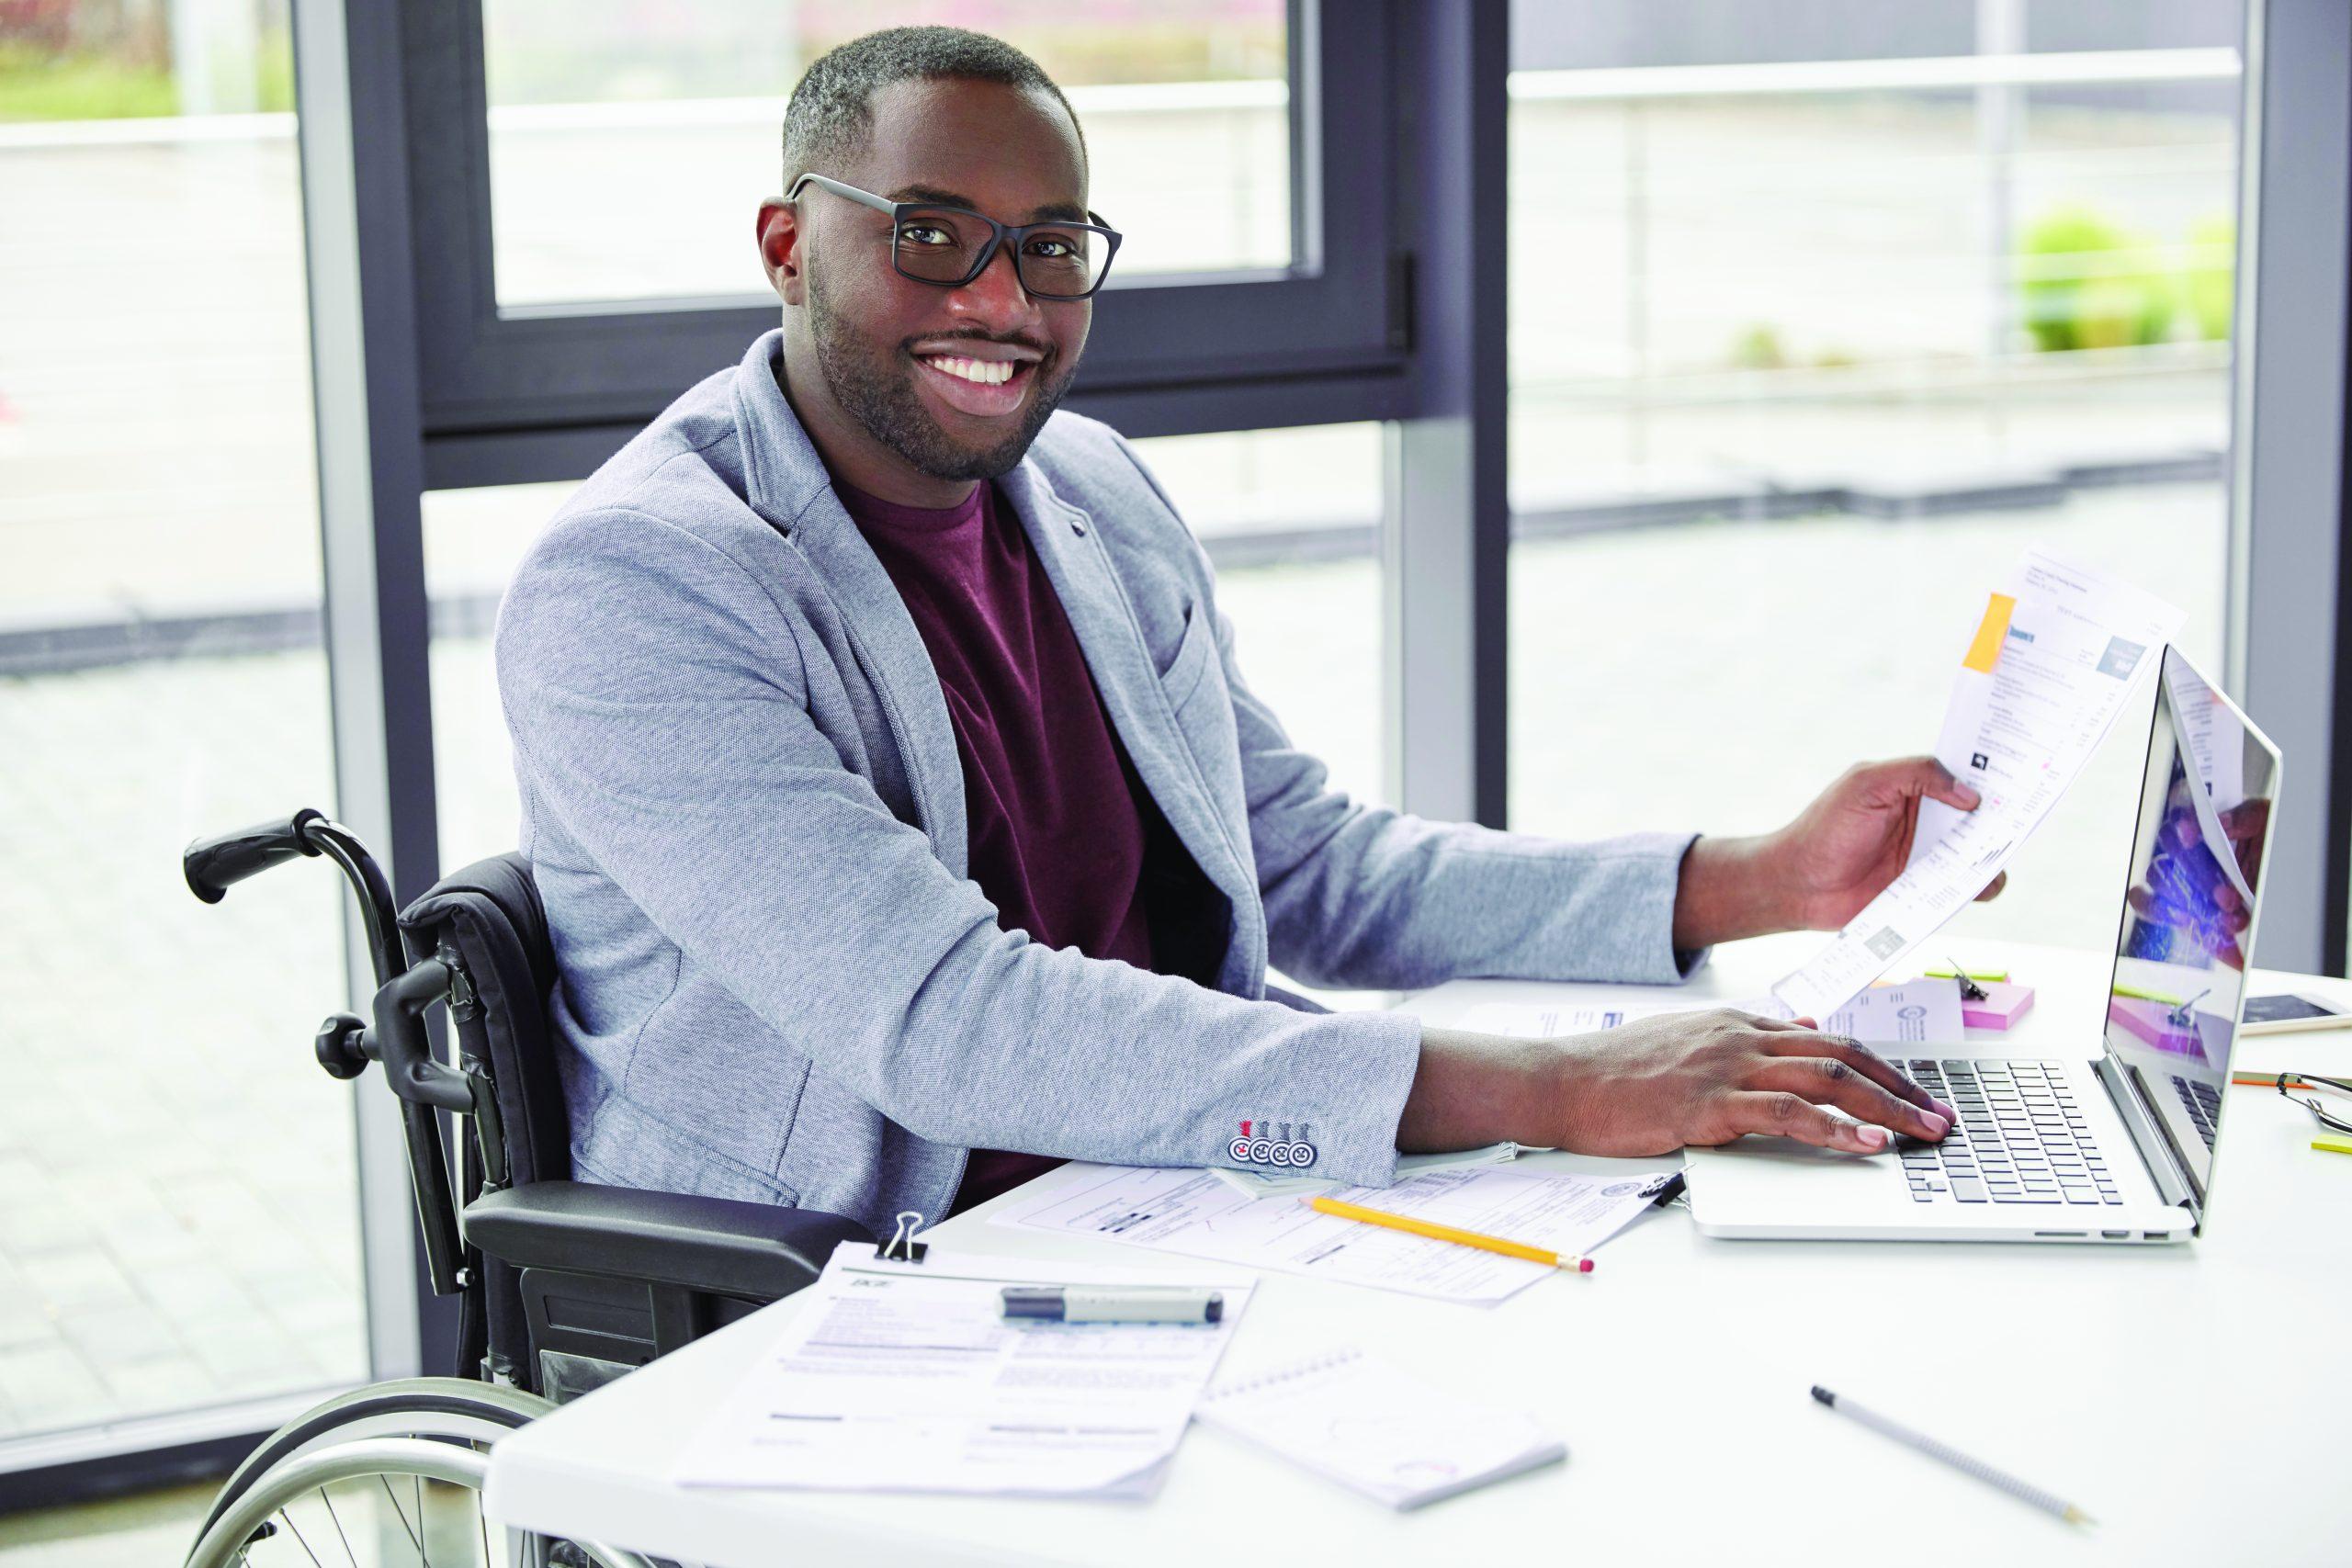 man at desk working